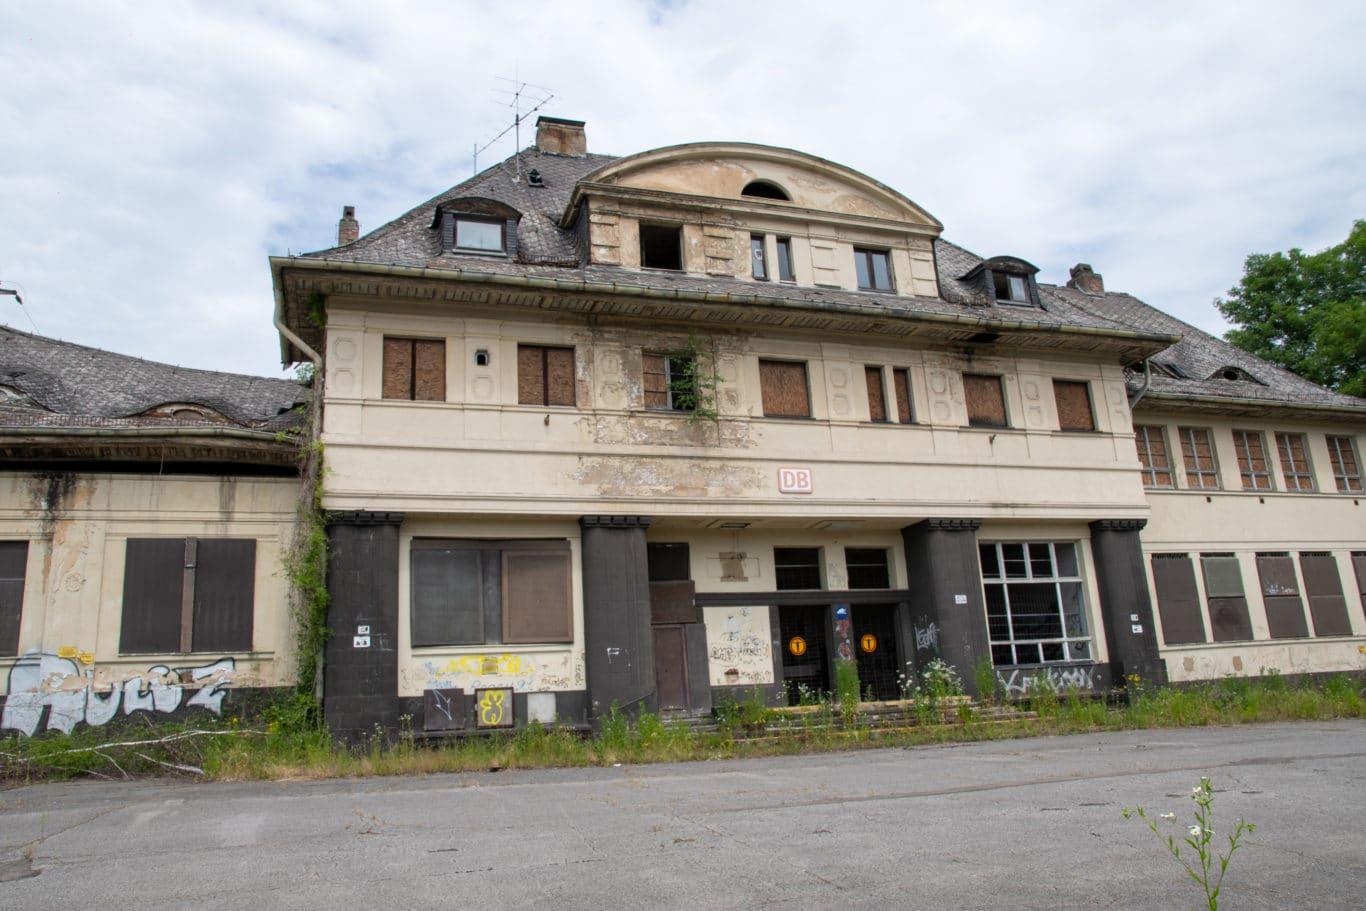 Bahnhof Friedrichsthal Juni 2021